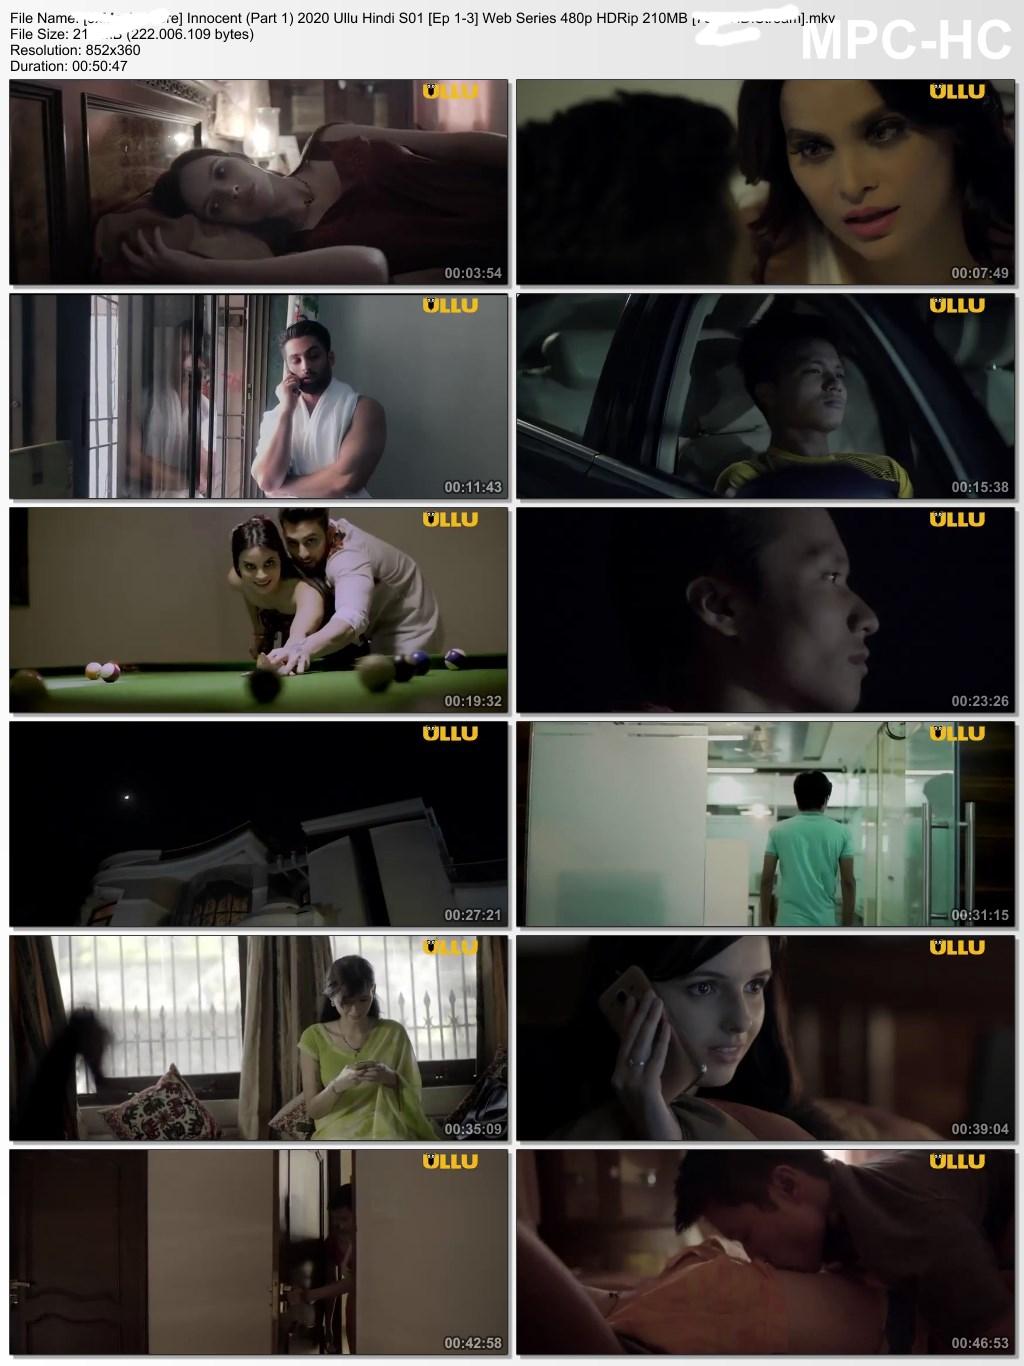 Innocent ullu s01 web Series